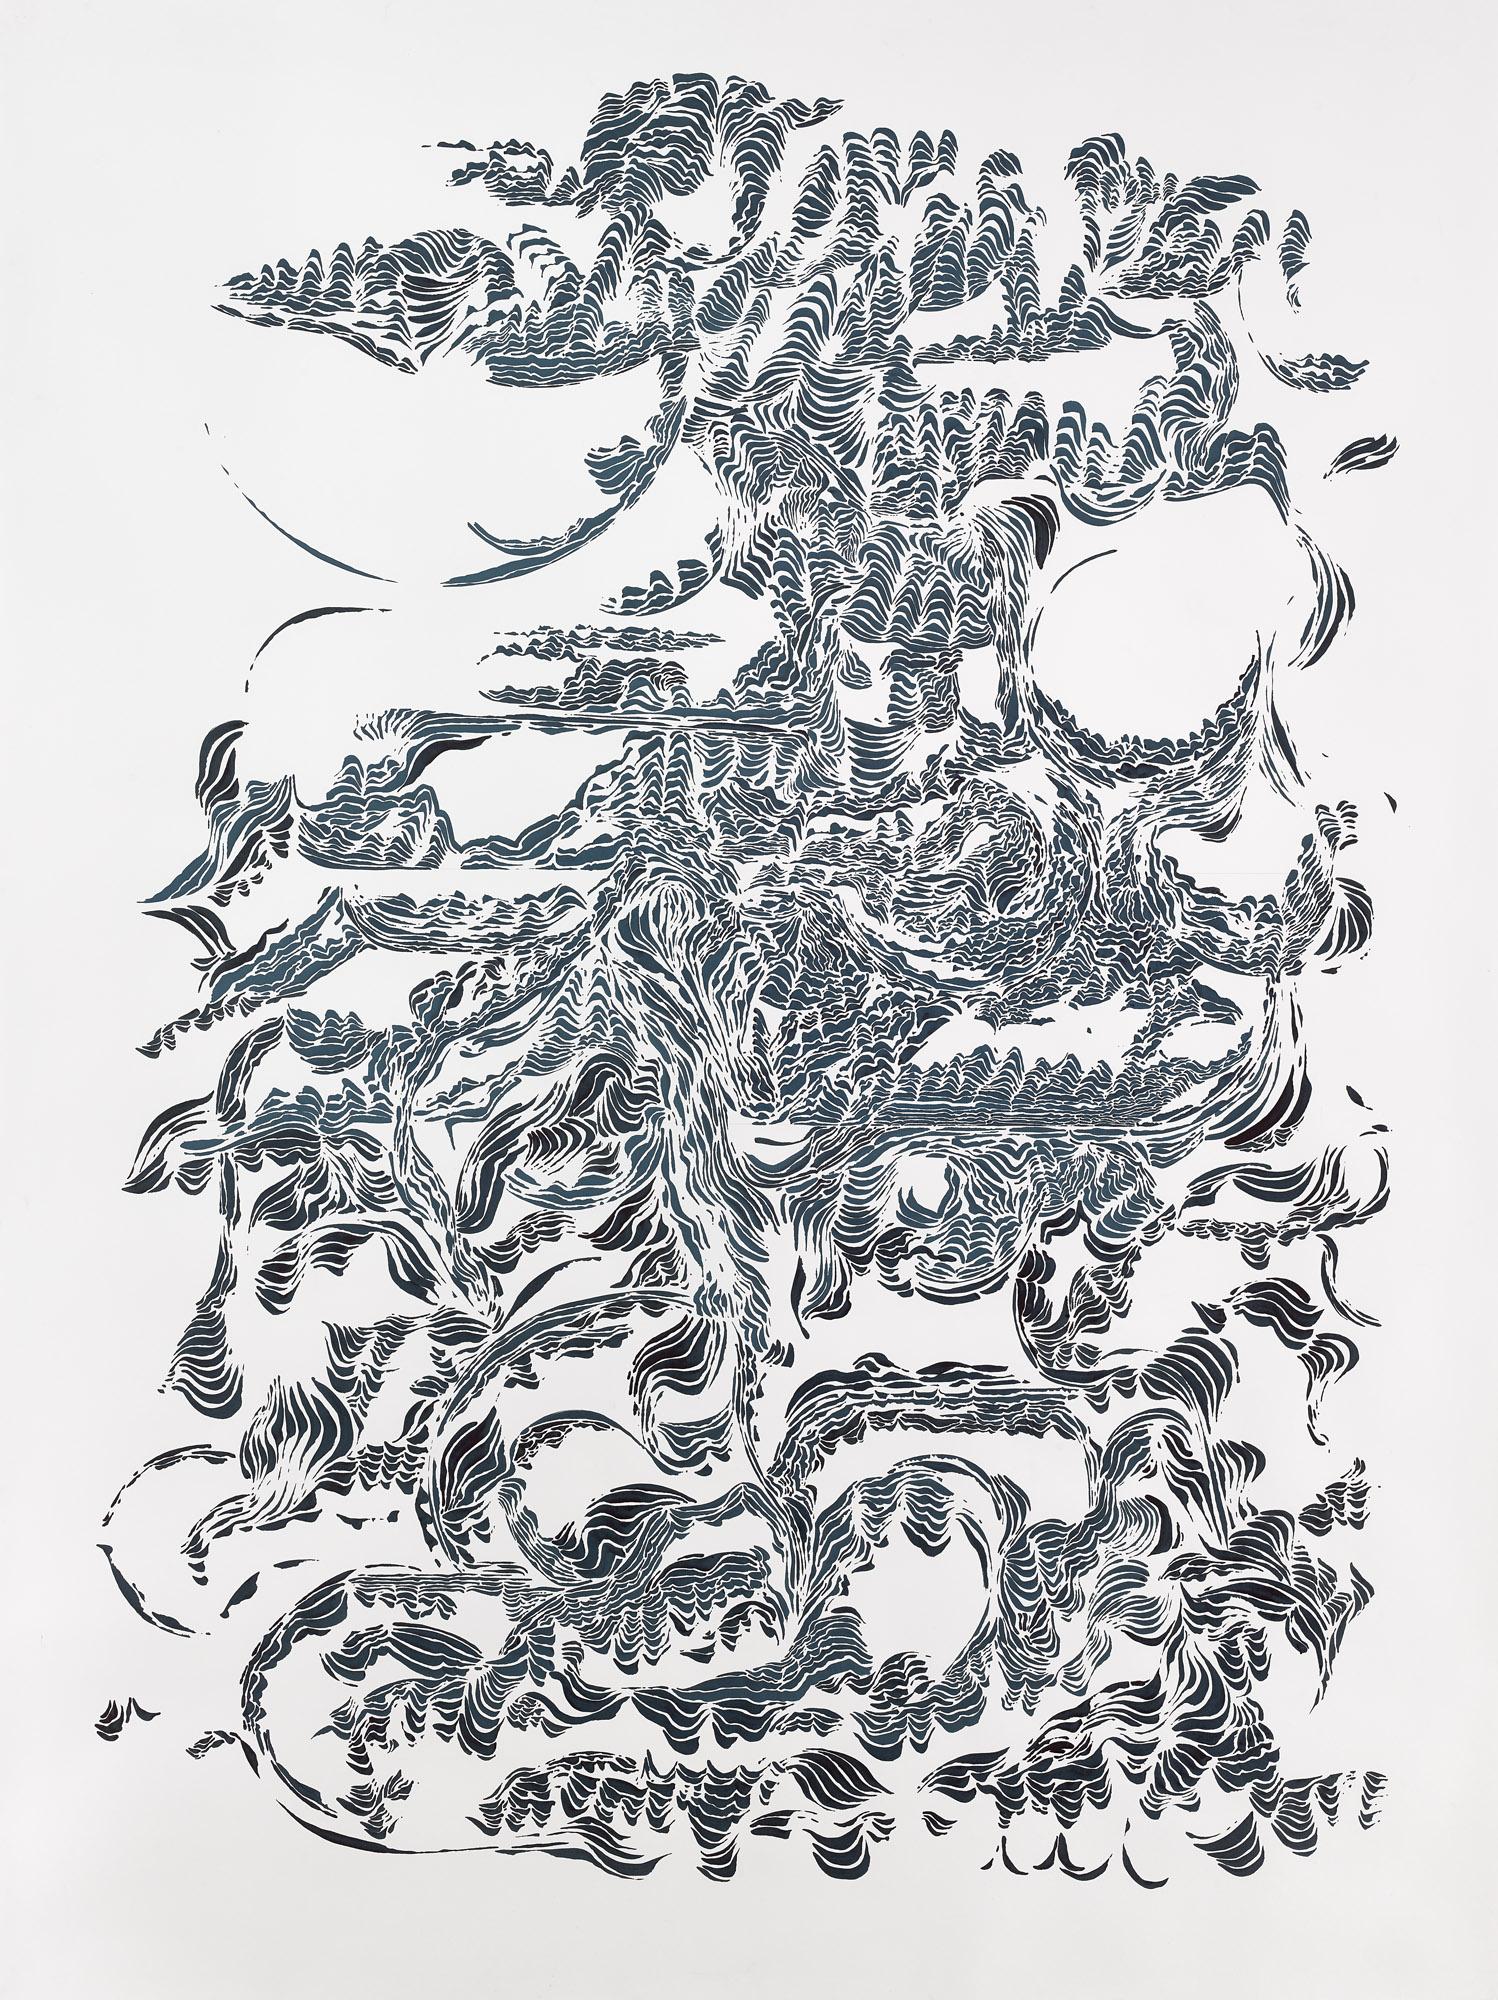 BK P11160 / untitled / ink on paper / 200x150cm / 2015